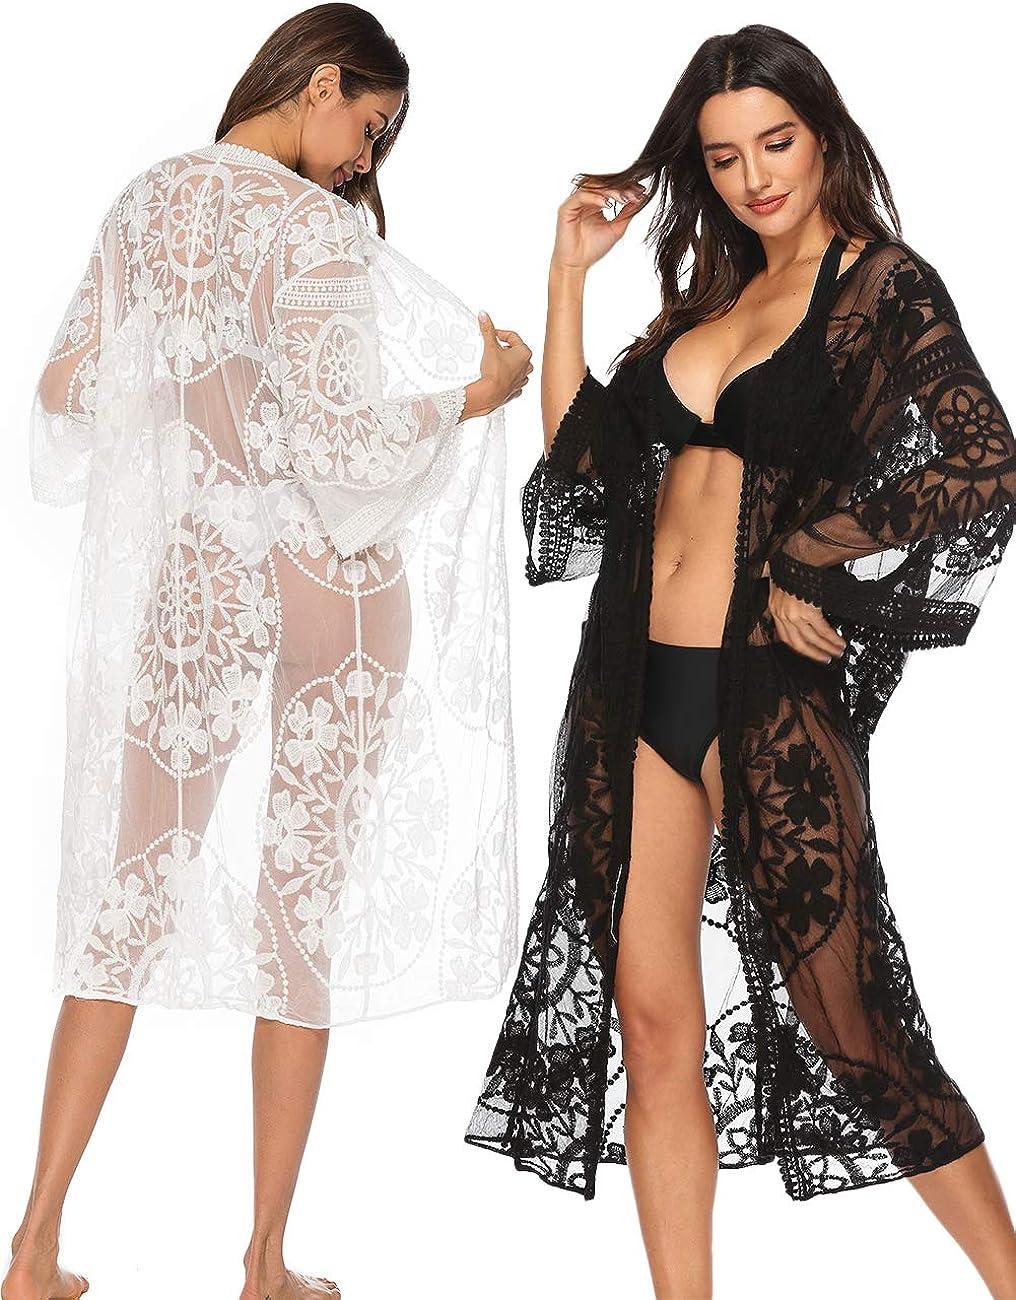 Amazon Com Womens White Kimono Lace Cover Up Black Lace Cardigan Crochet Swim Cover Up Clothing